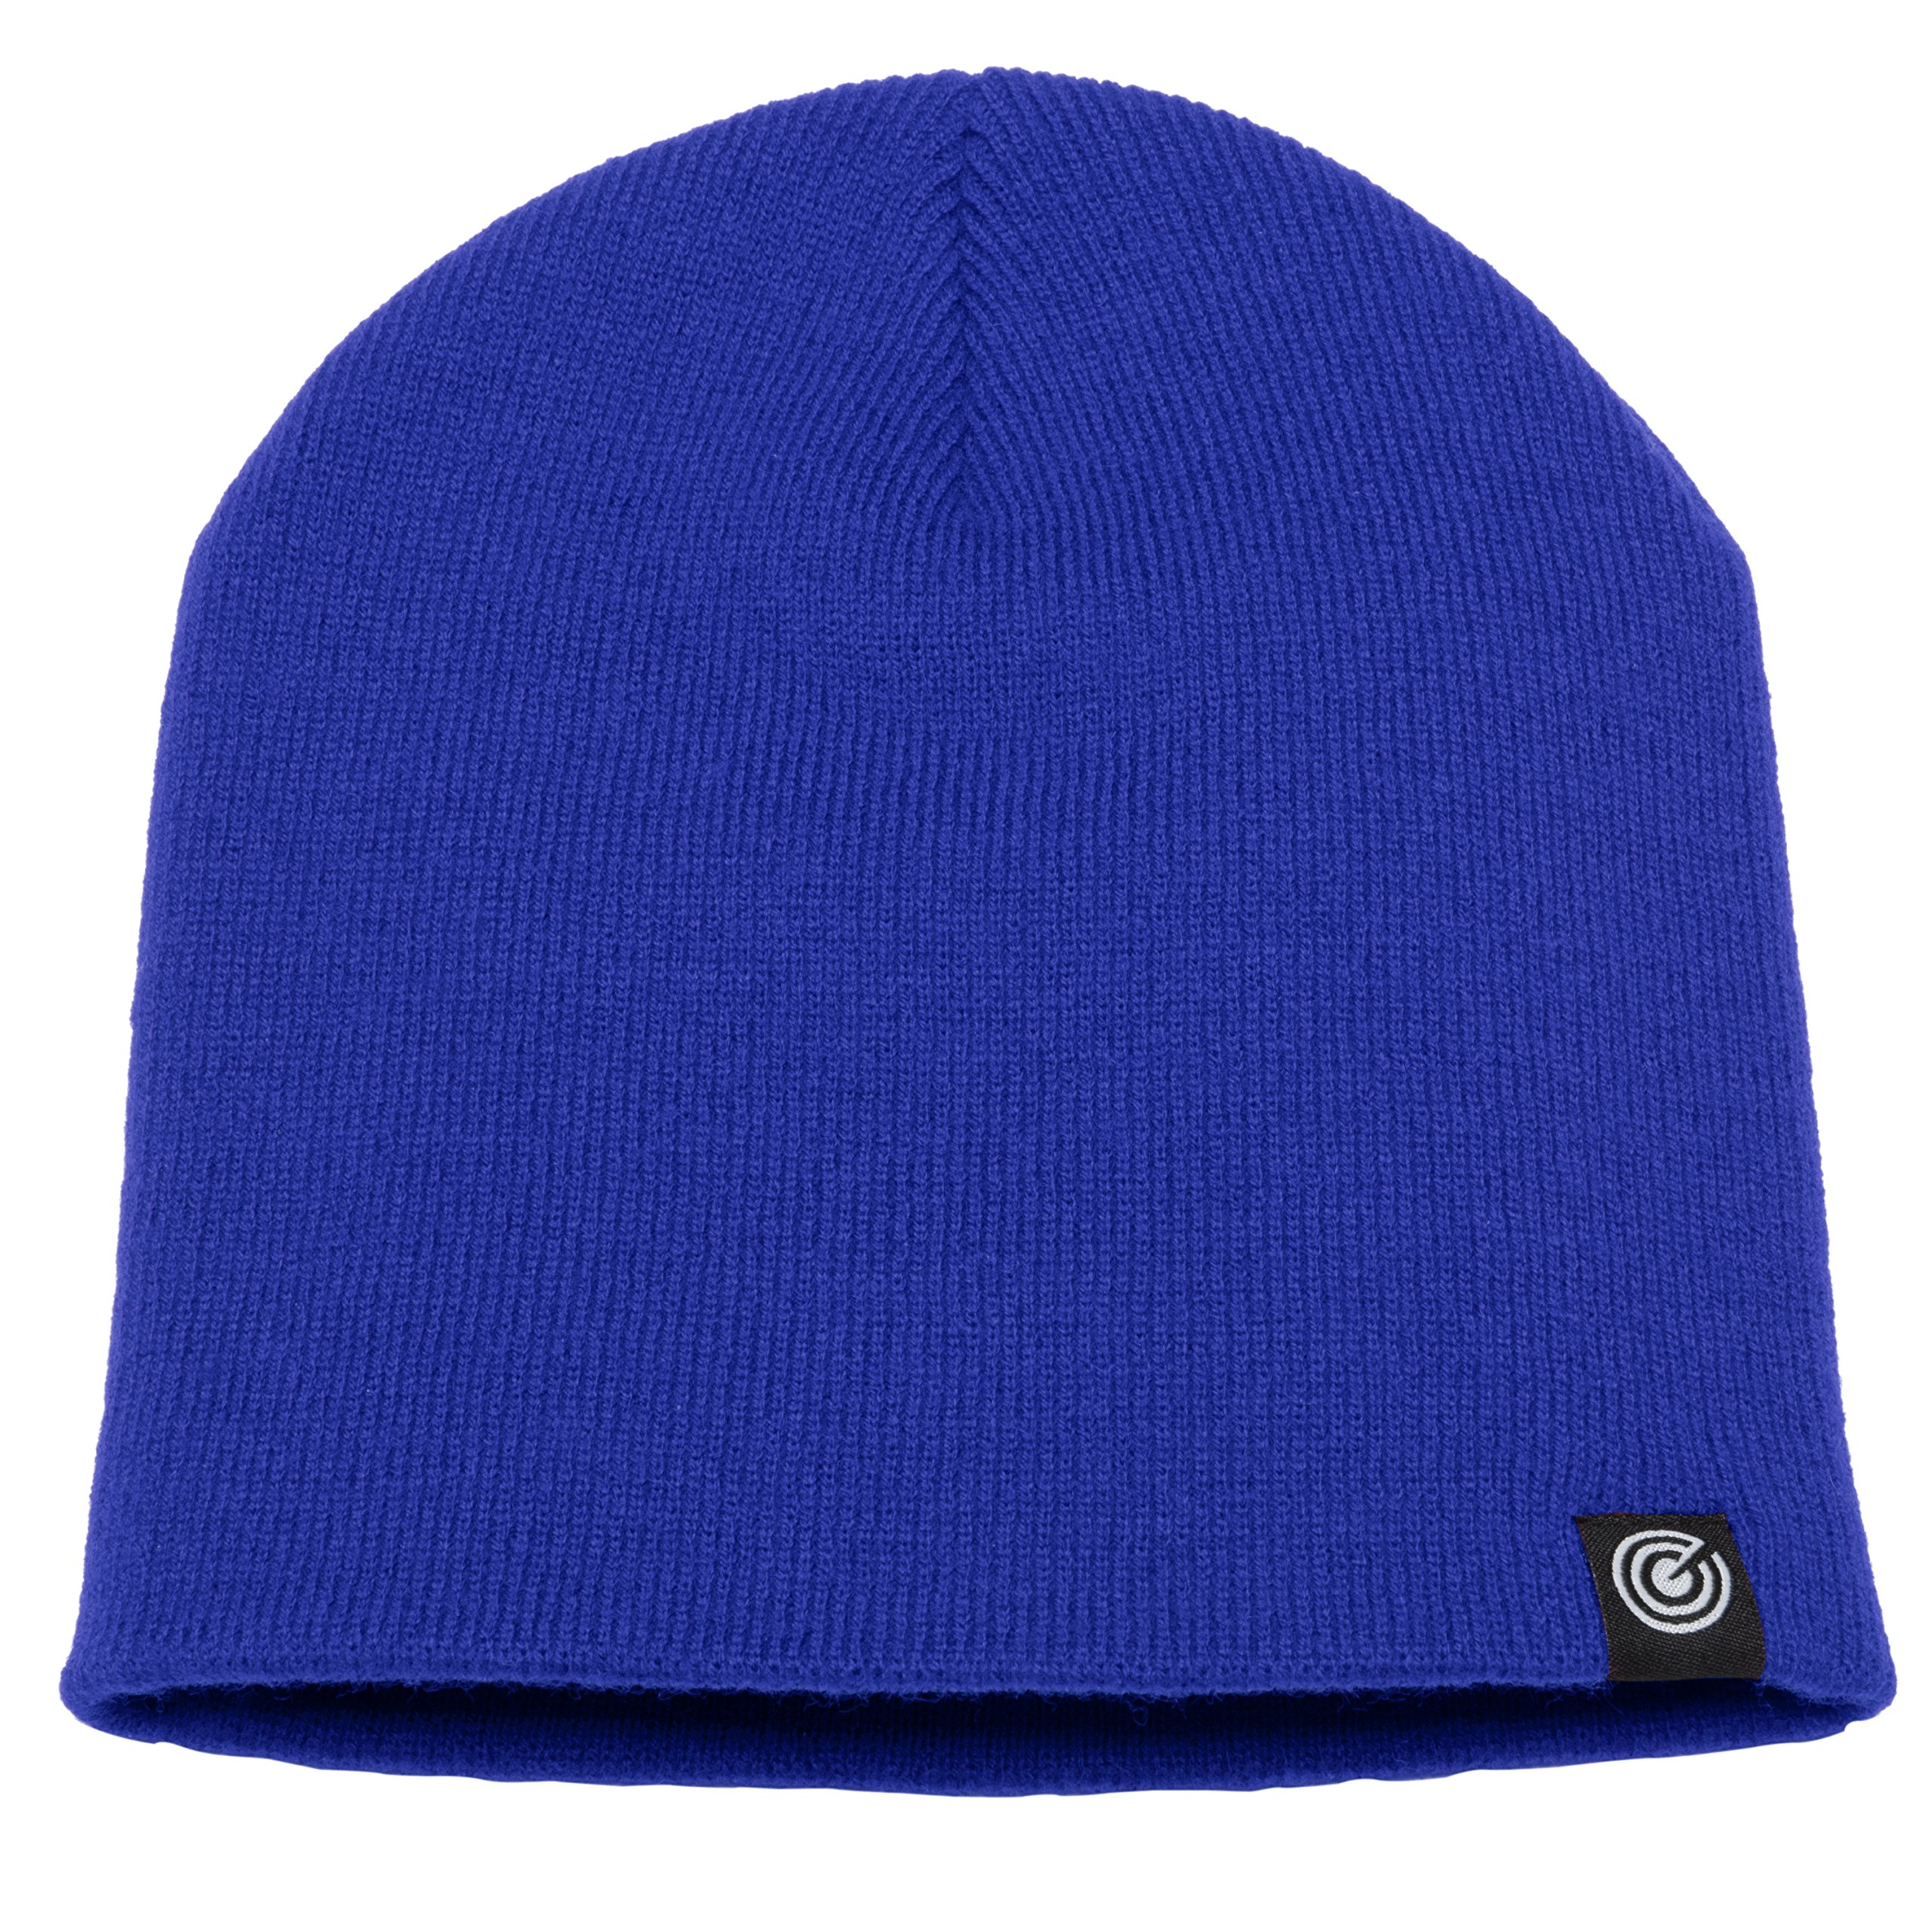 Evony Original Beanie Cap - Soft Knit Beanie Hat - Warm and Durable (Royal Blue)